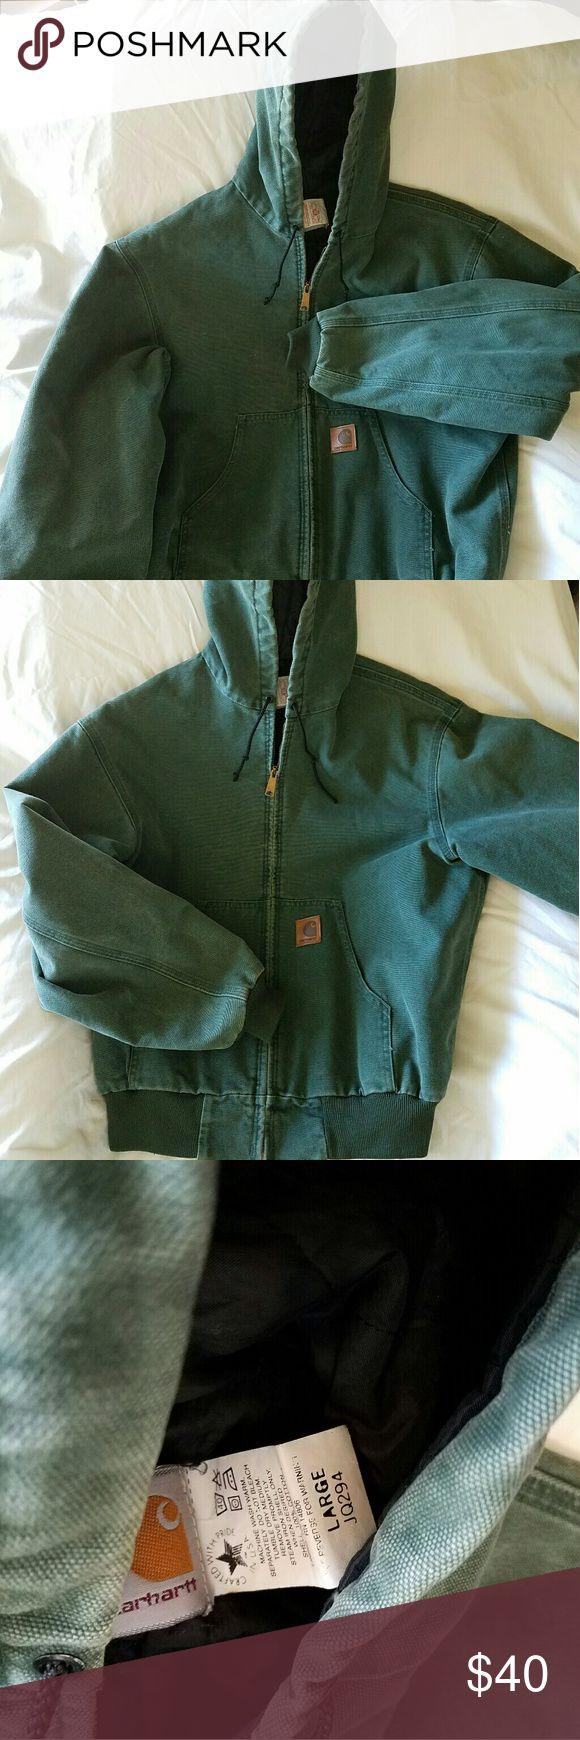 Carhartt Jacket Gently used Carhartt Jacket! Carhartt Jackets & Coats Utility Jackets